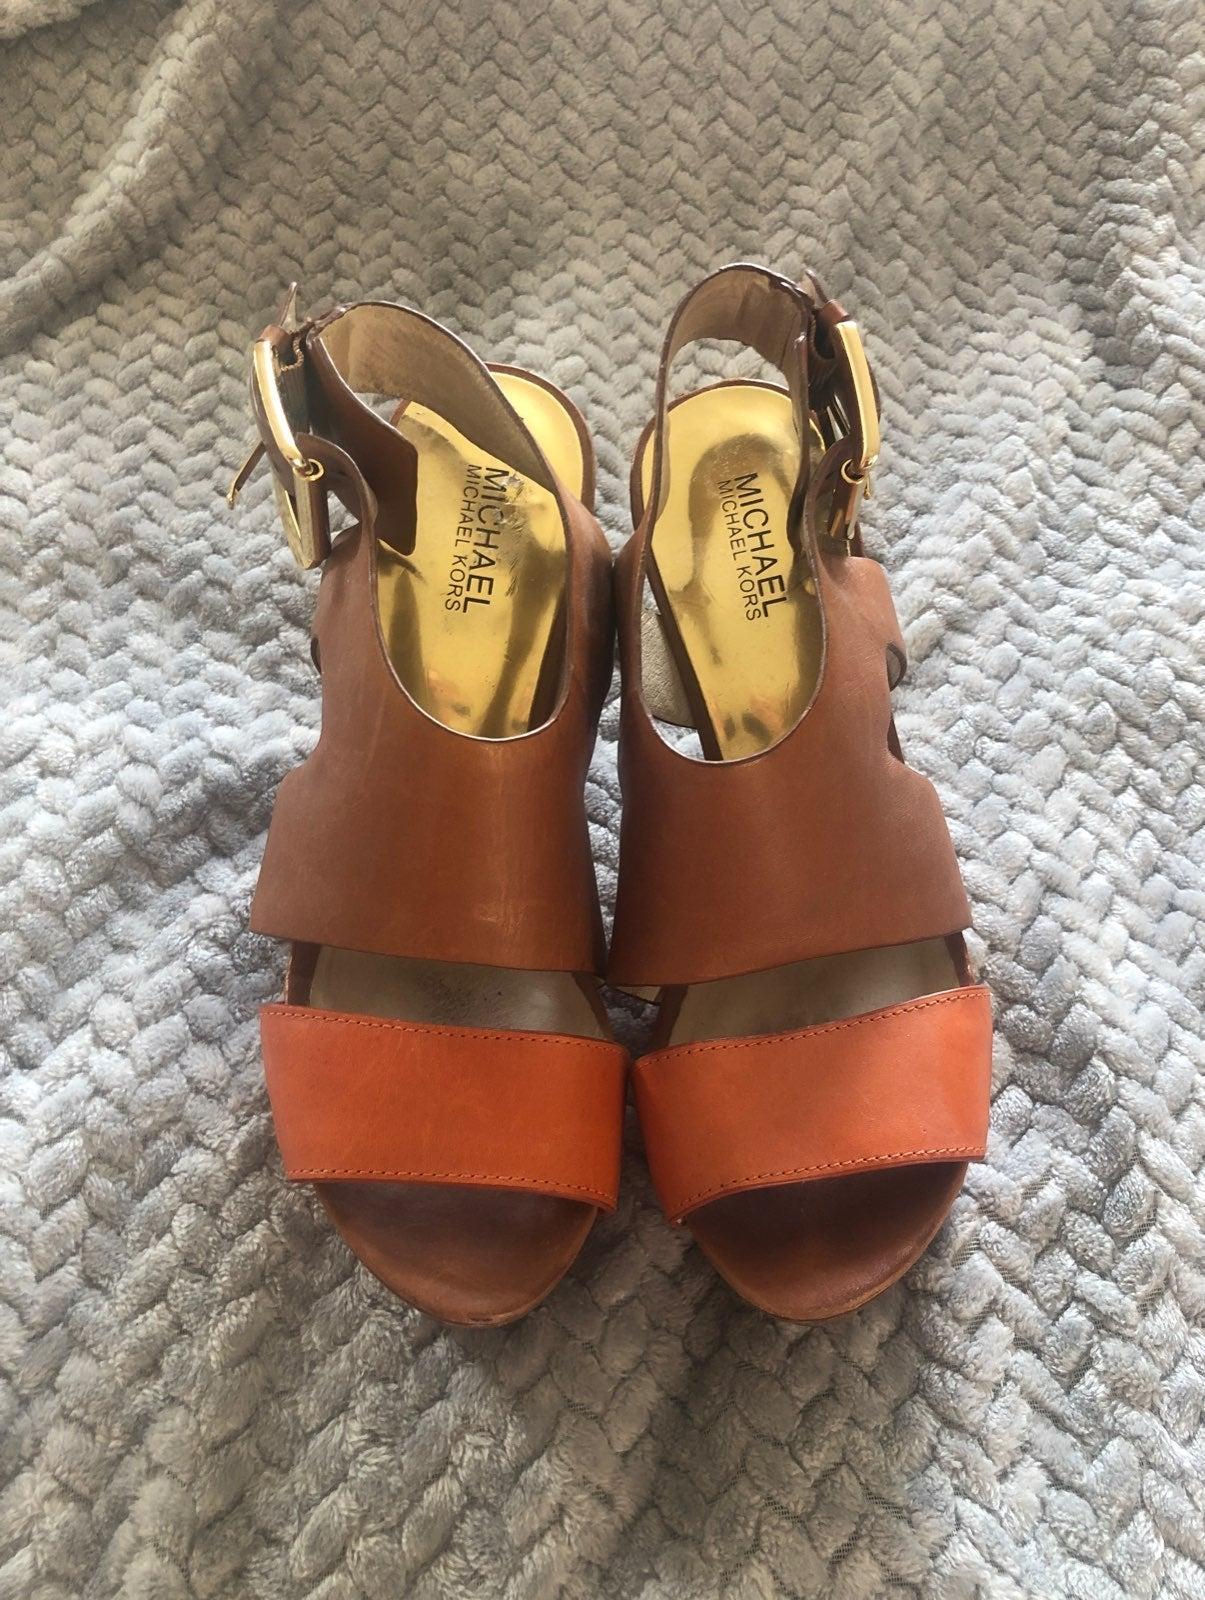 Michael Kors Womens Heels Size 9